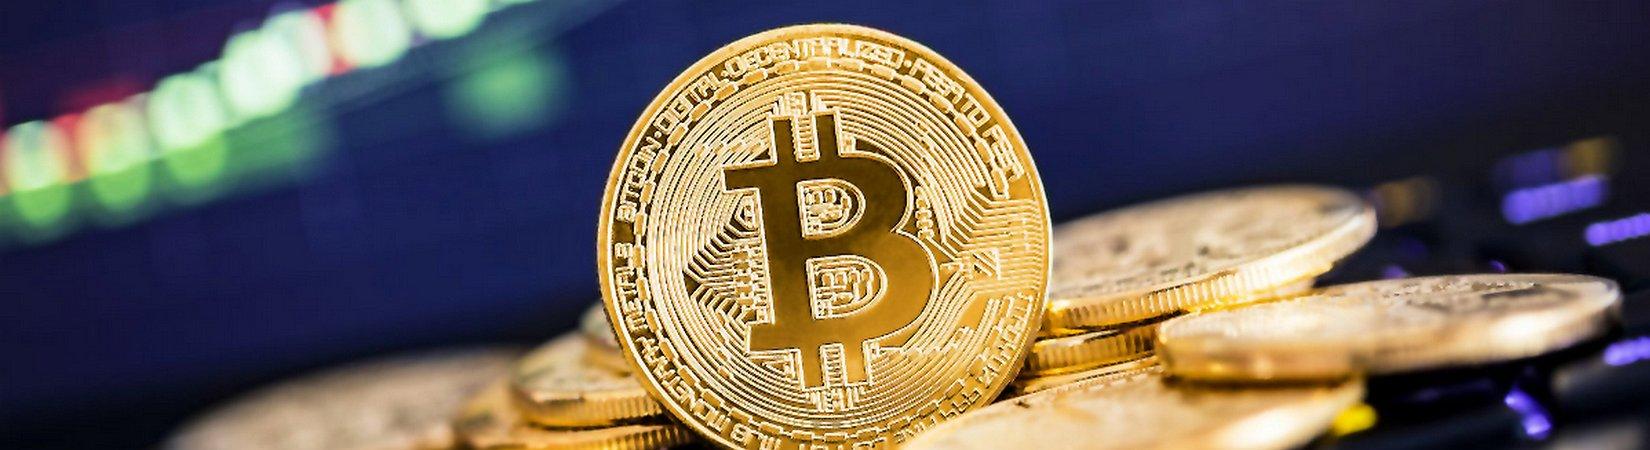 Bitcoin localbitcoins net